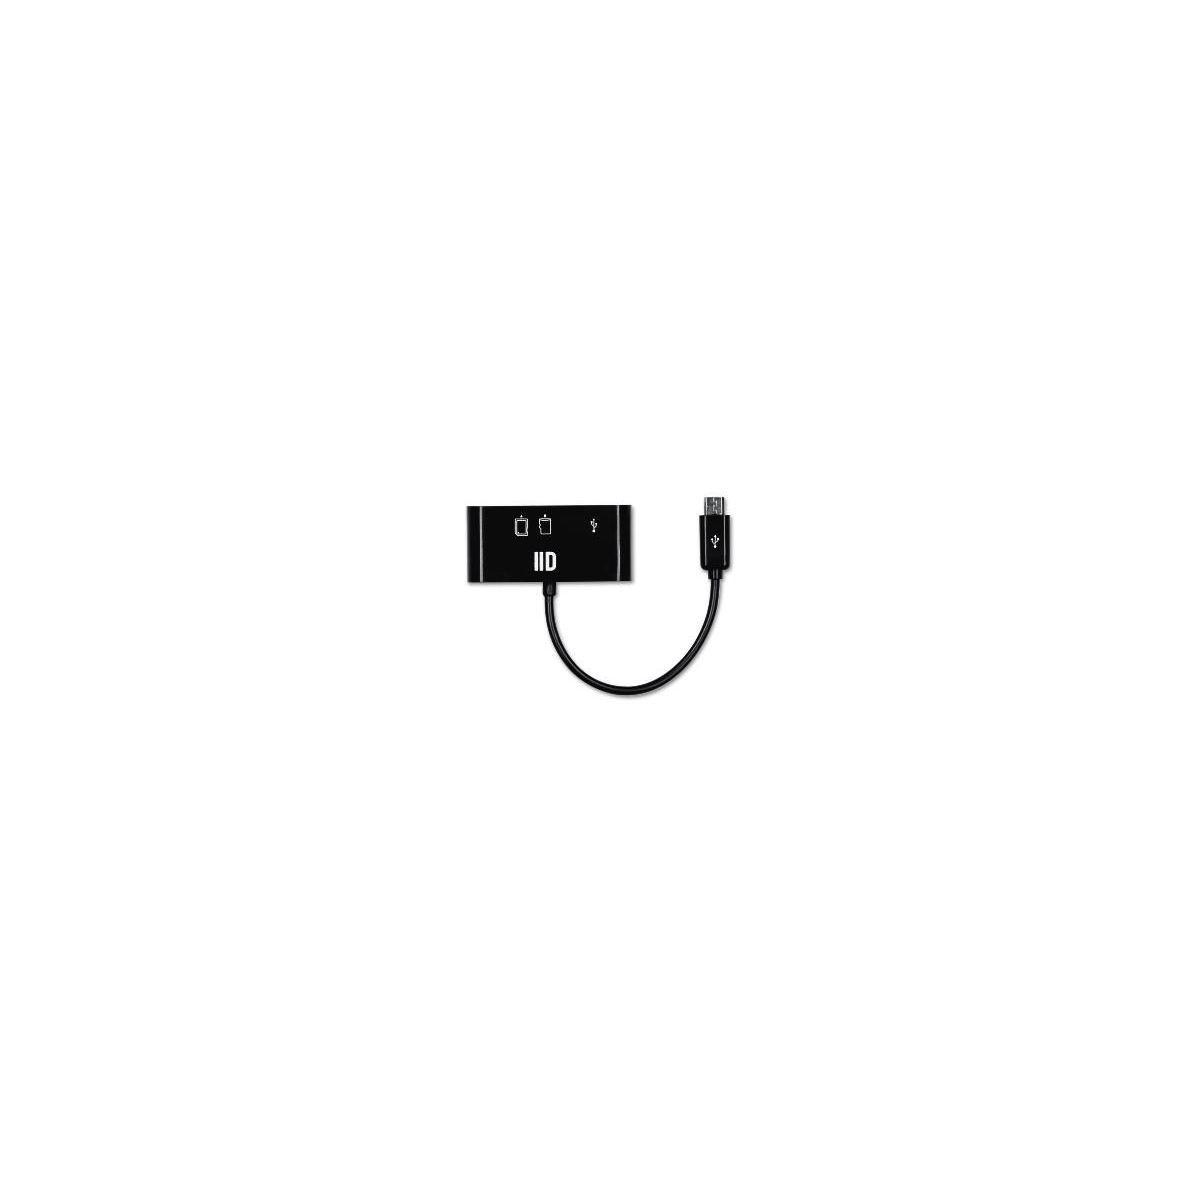 Lecteur d2 sd micro sd port micro usb (photo)